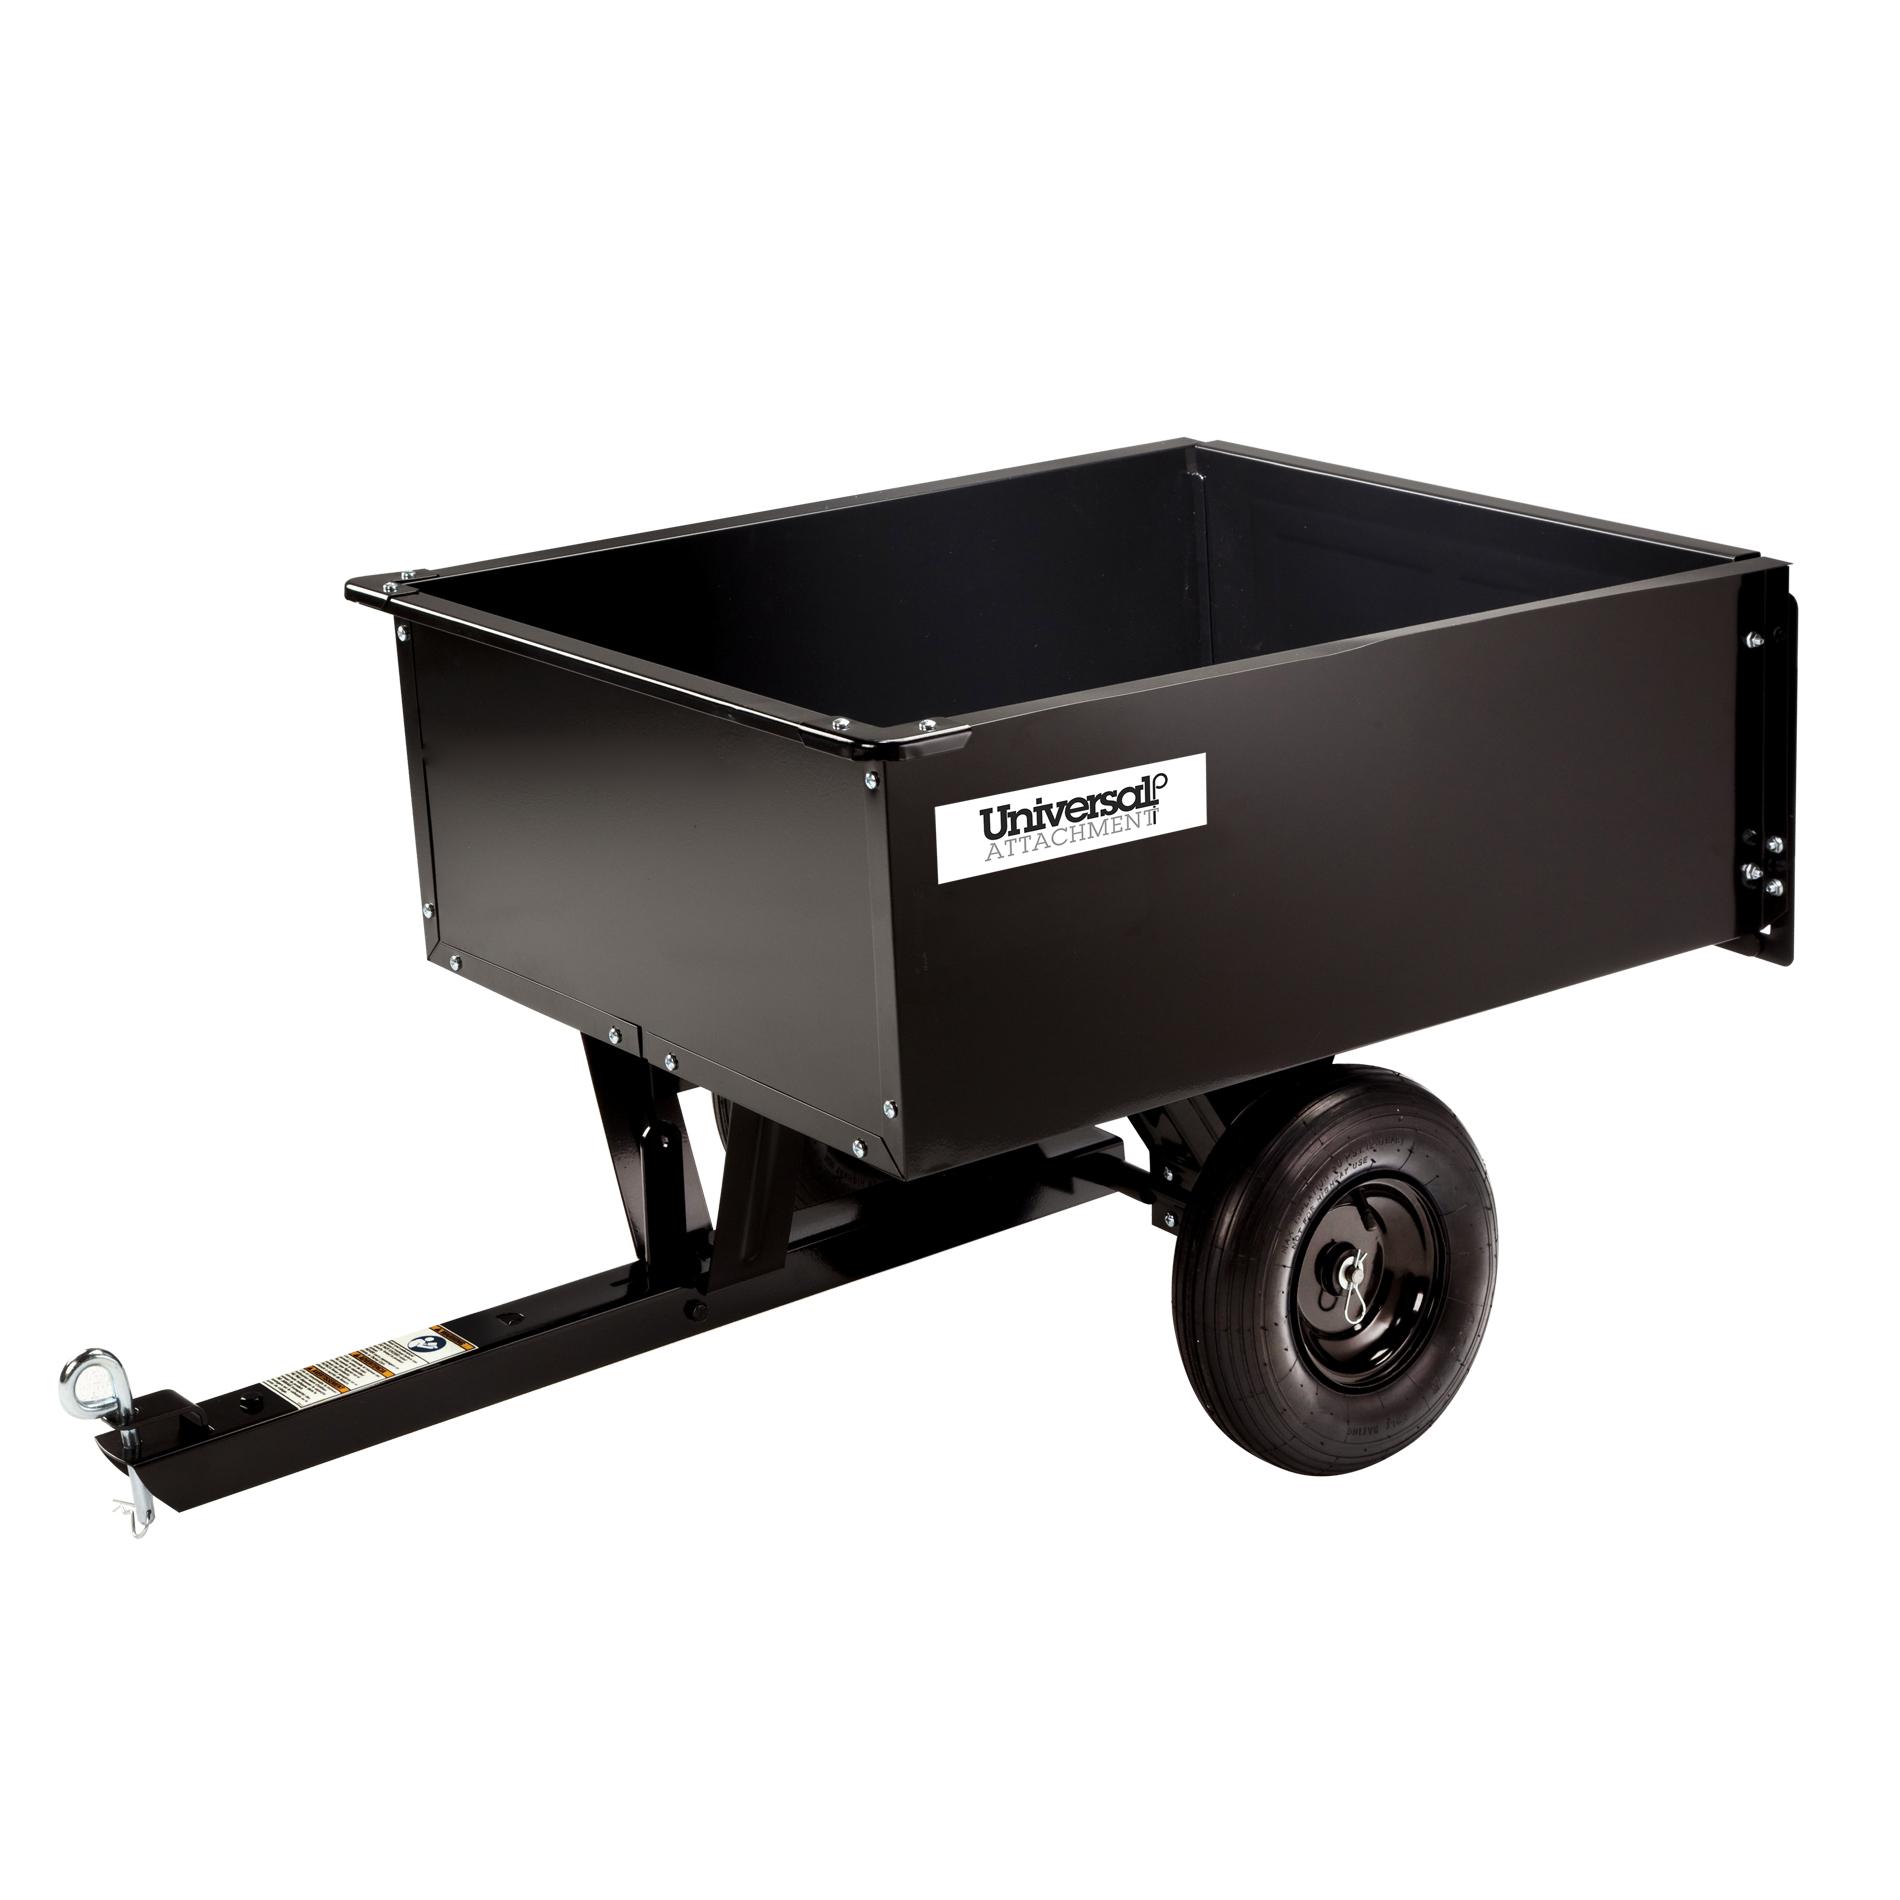 Universal 9 Cu Ft Steel Dump Cart